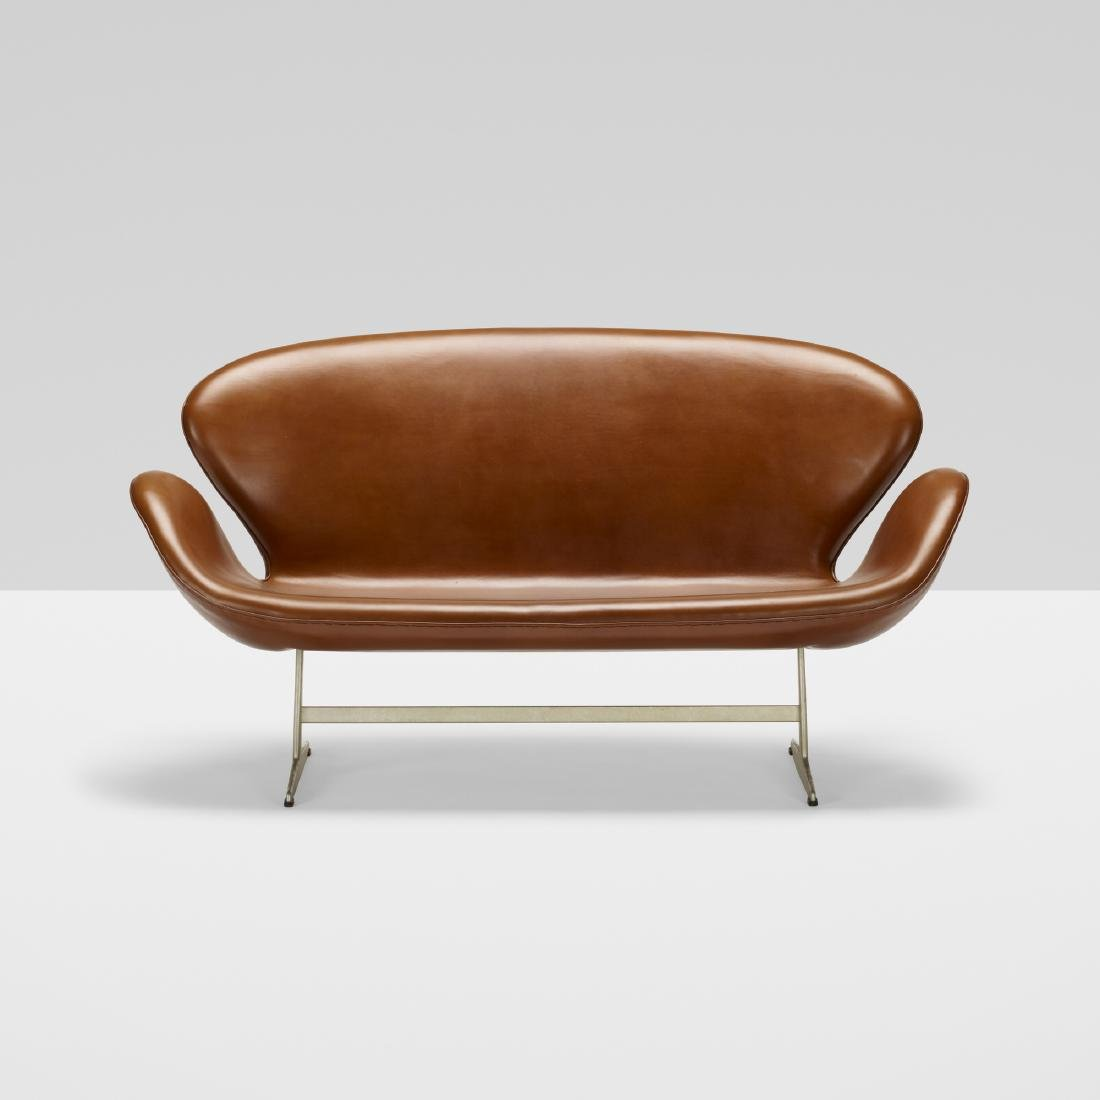 Arne Jacobsen, Swan settee, model 3321